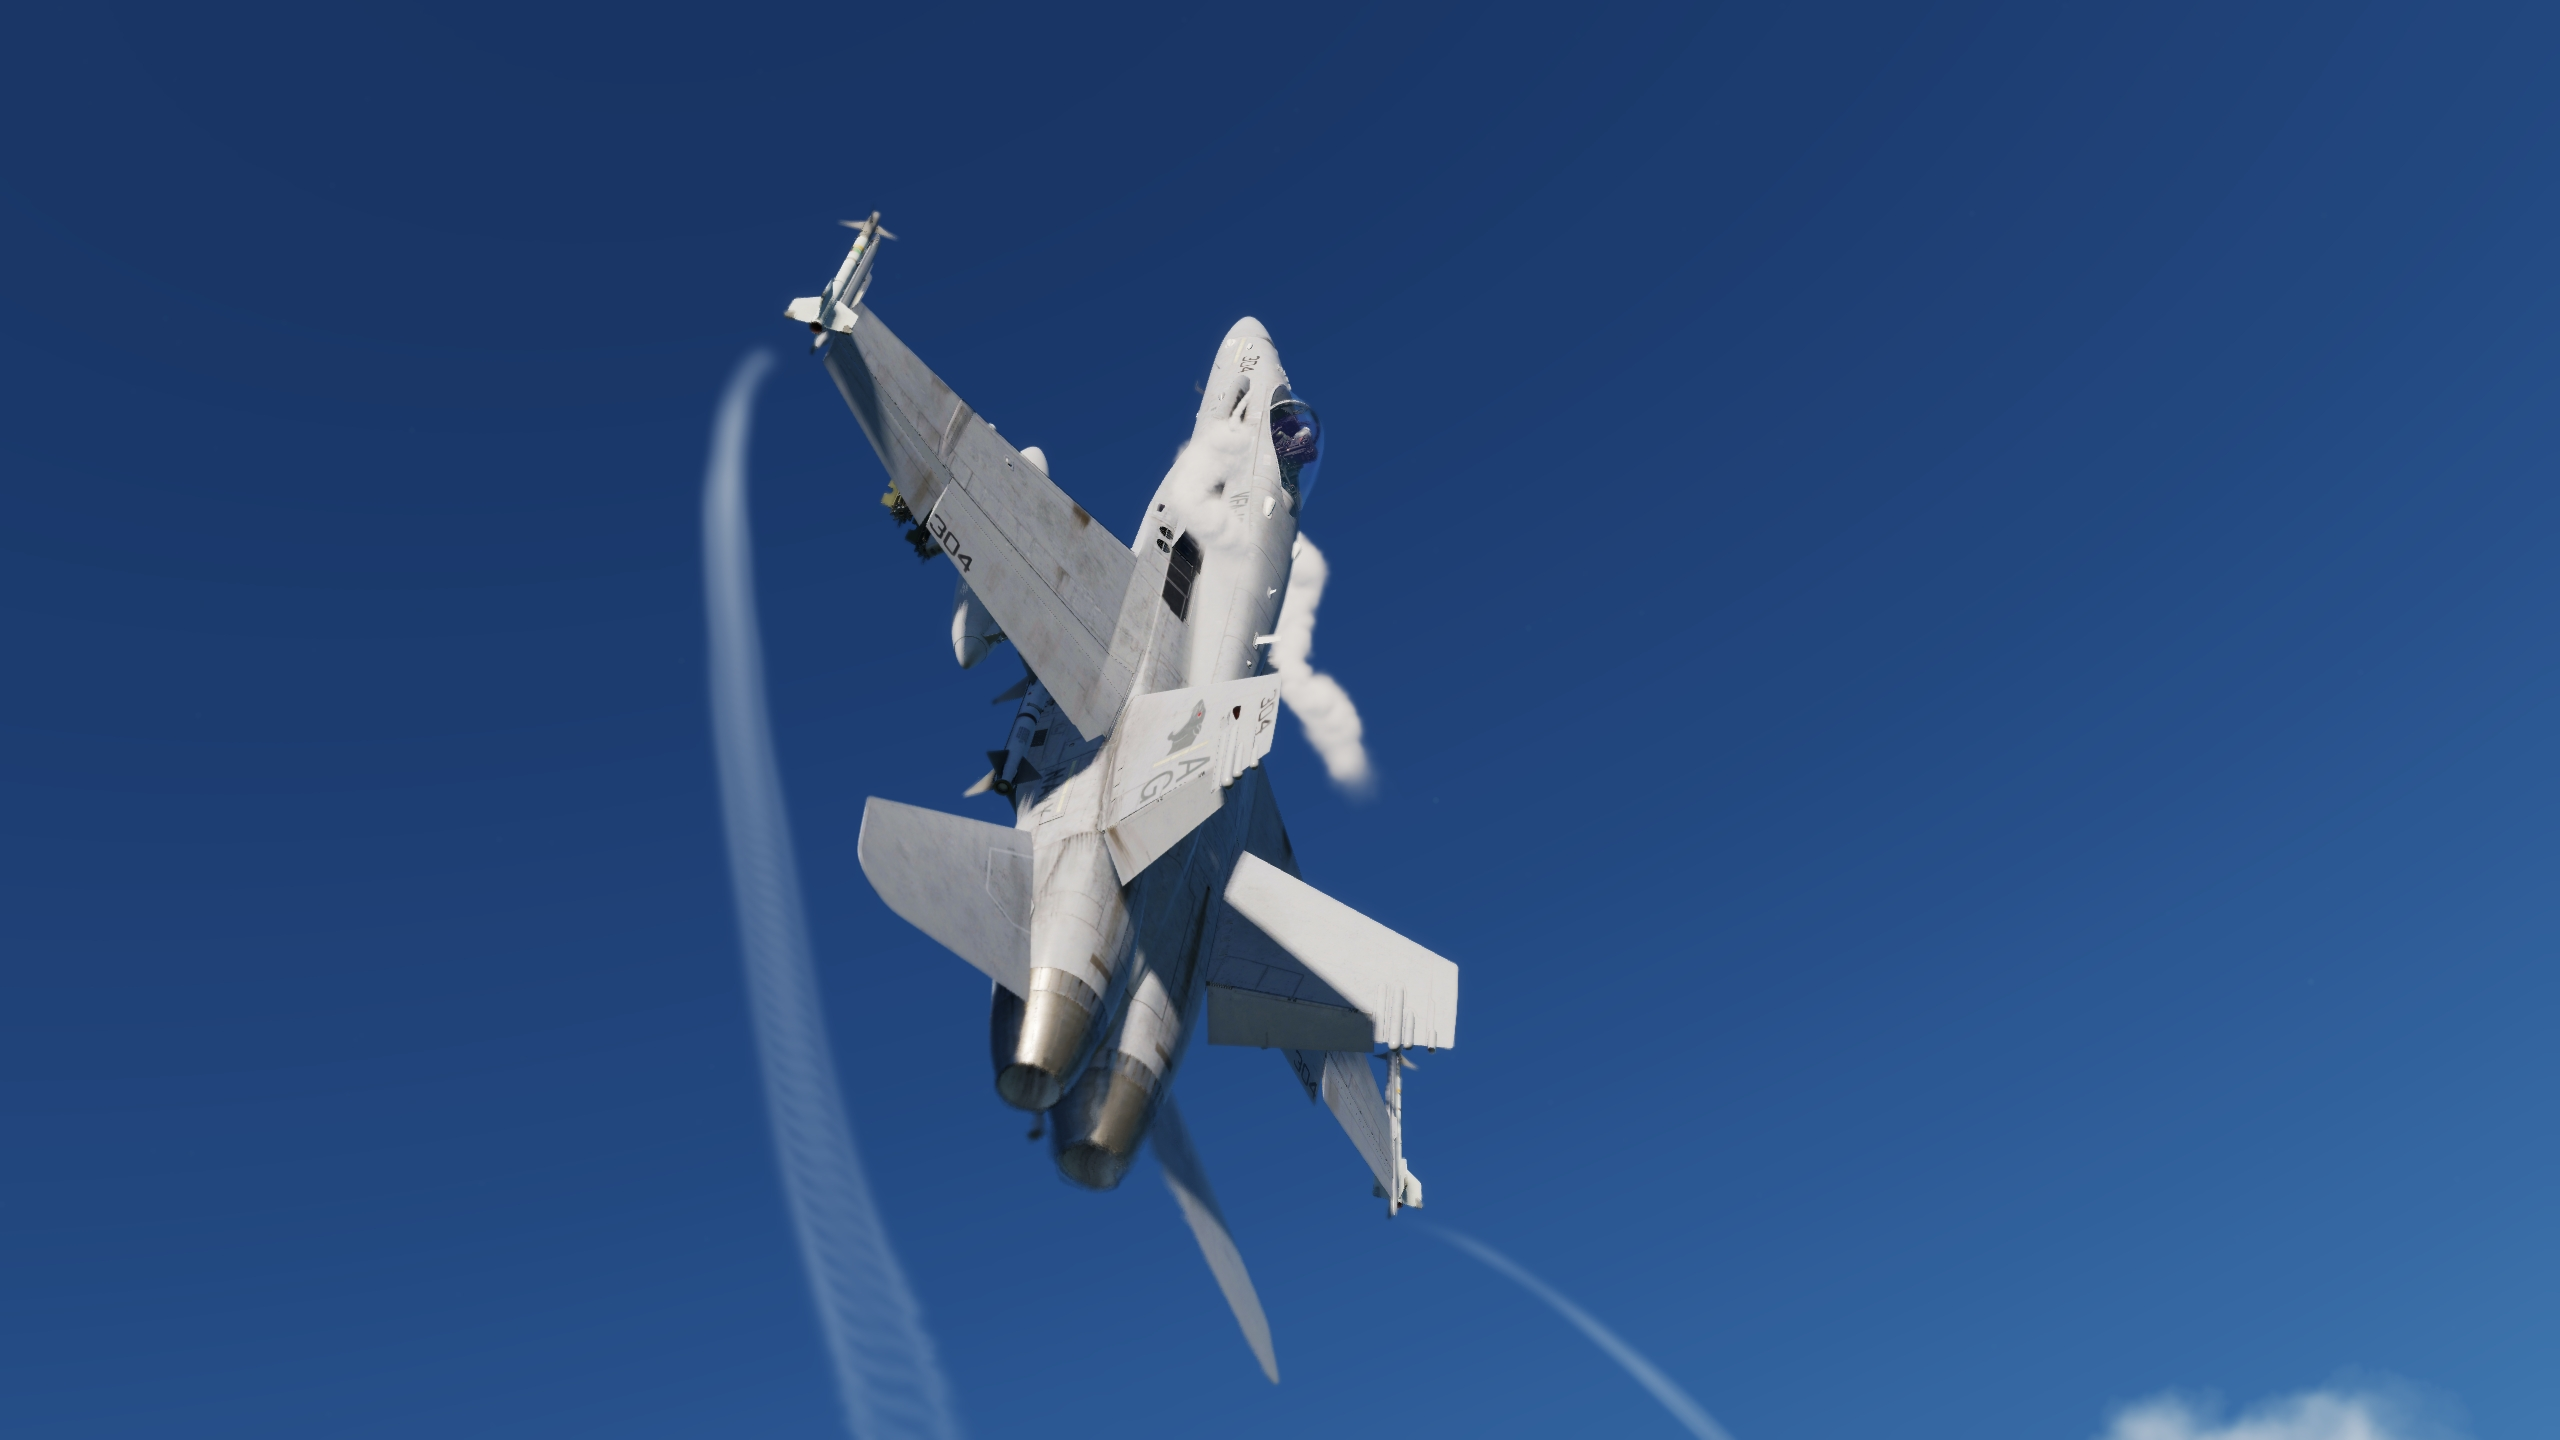 Employee of flight sim developer arrested for attempting to smuggle jet fighter manuals